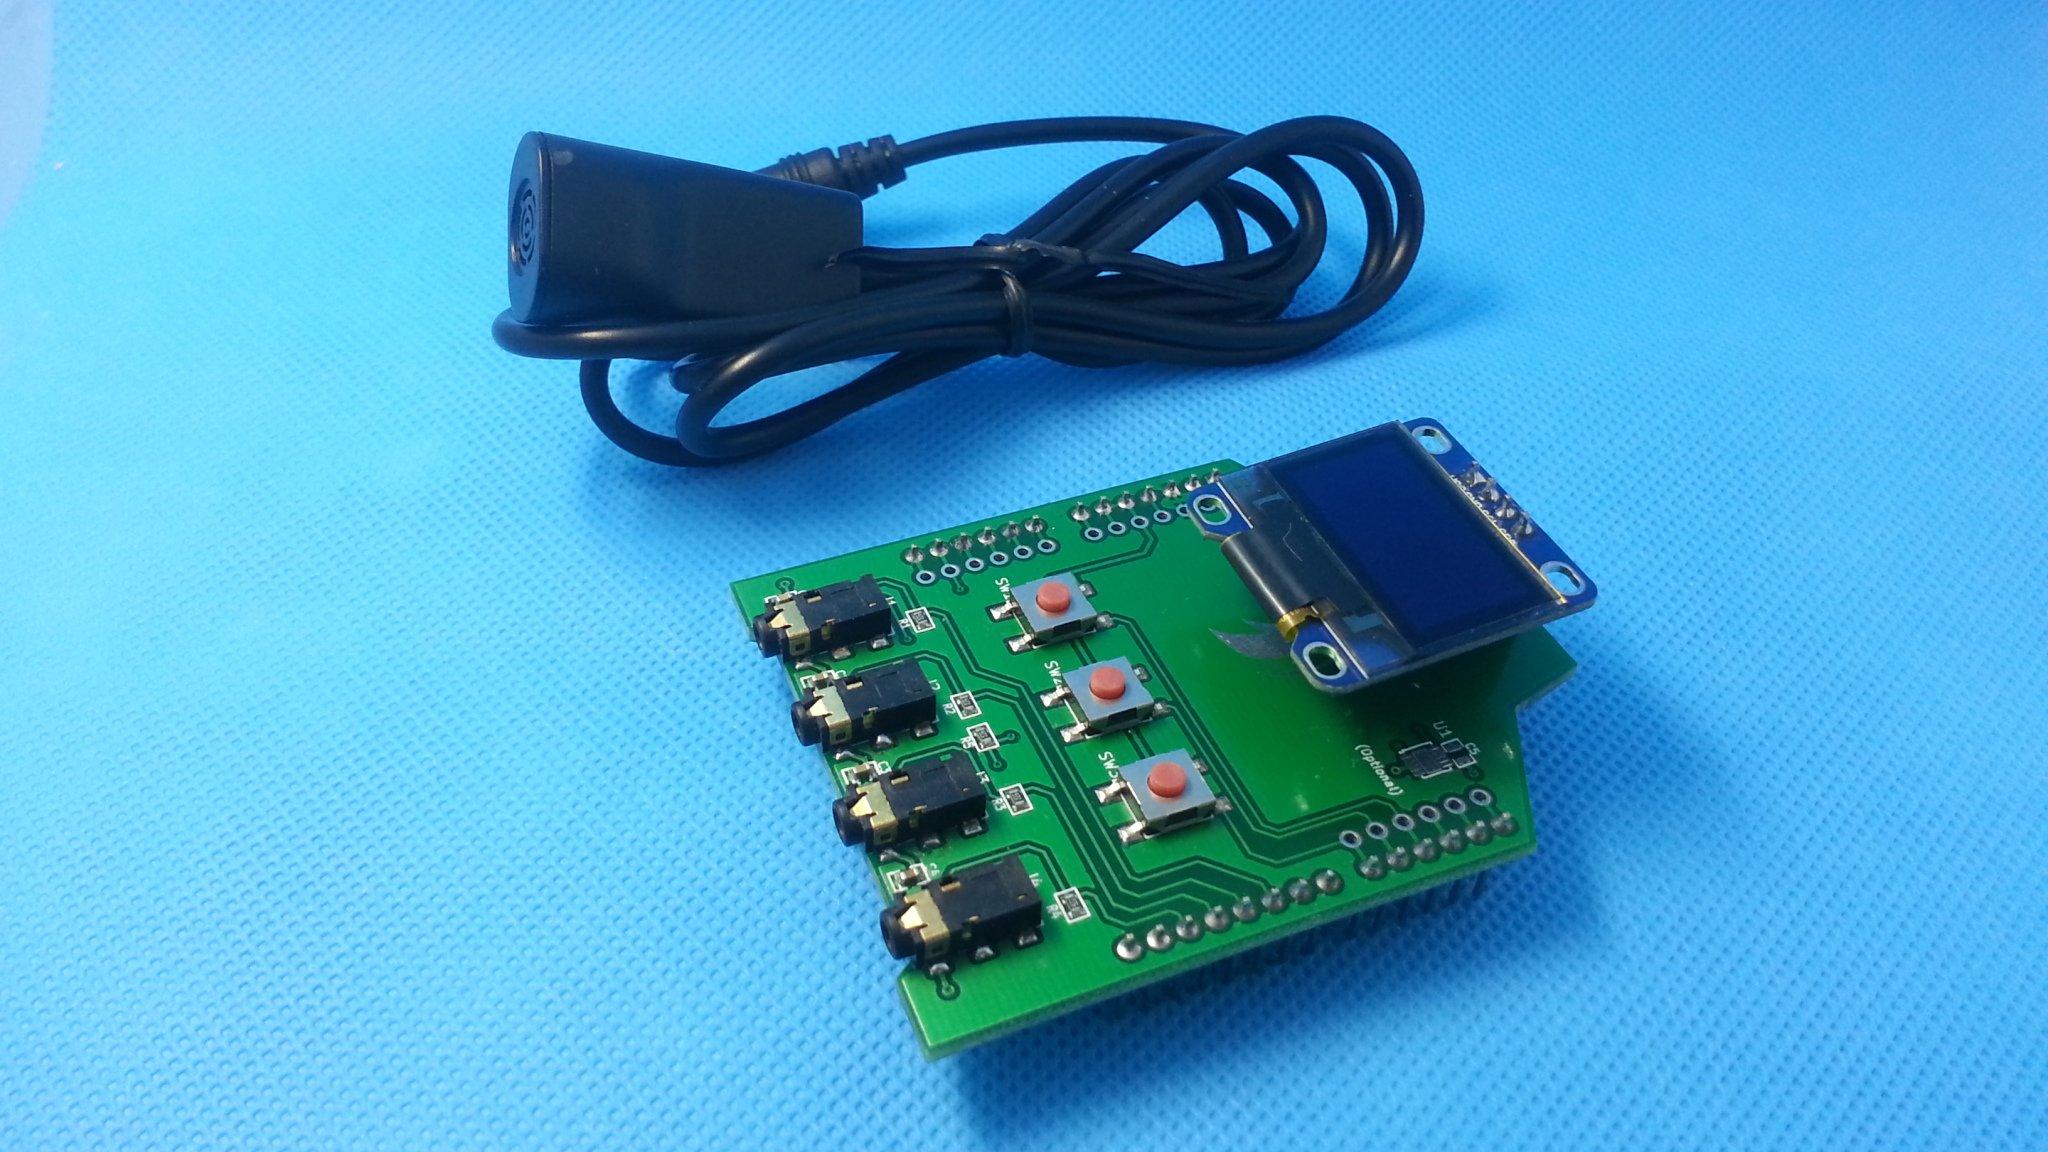 Iot arduino temperature humidity shield probe from